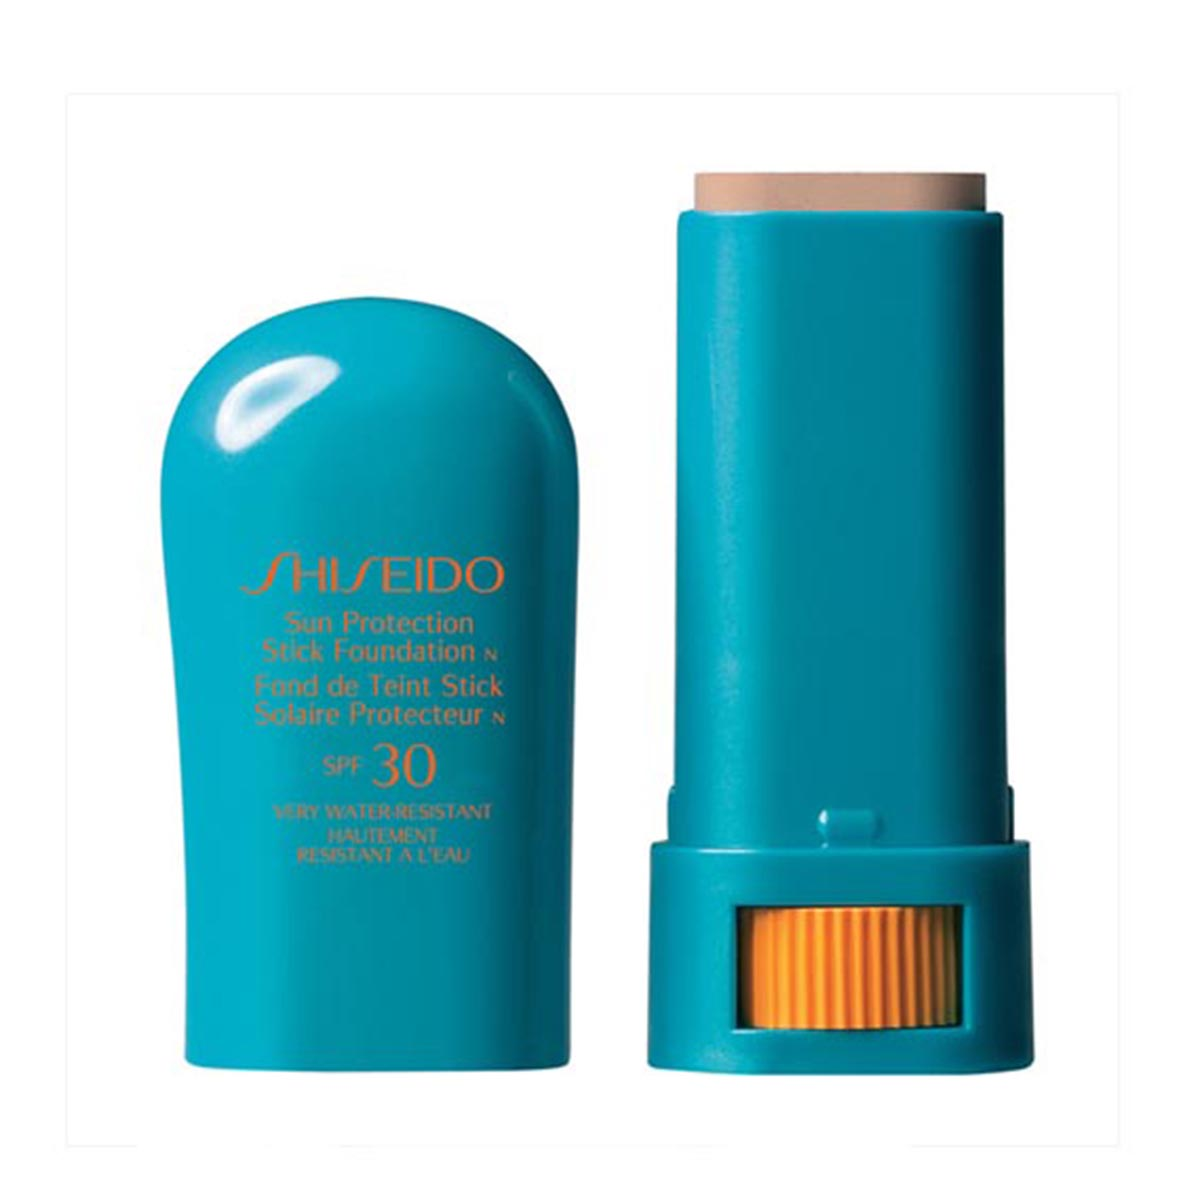 Shiseido suncare stick fi